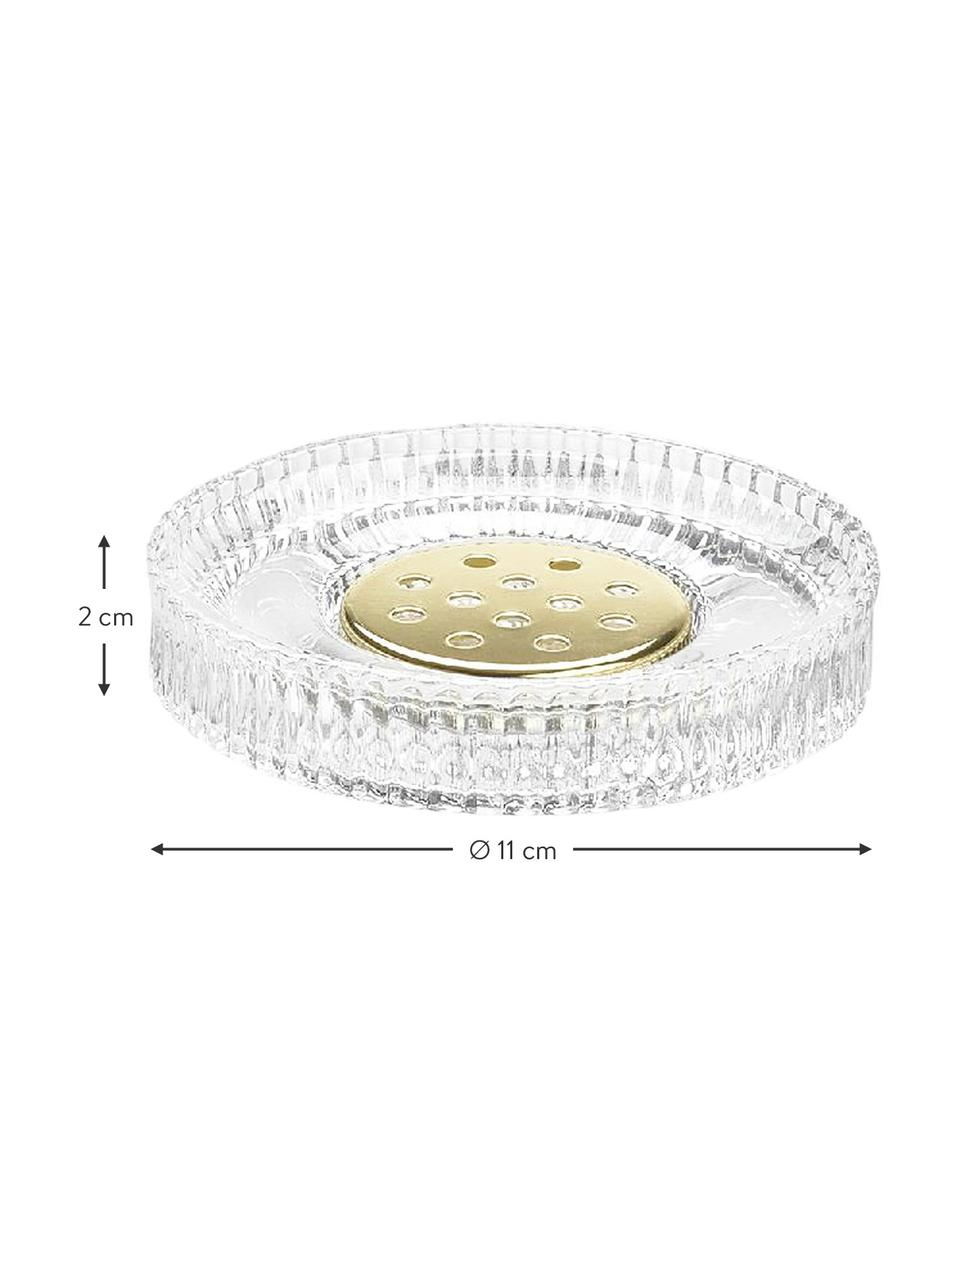 Zeepbakje Gulji van glas, Glas, Transparant, goudkleurig, Ø 11 x H 2 cm